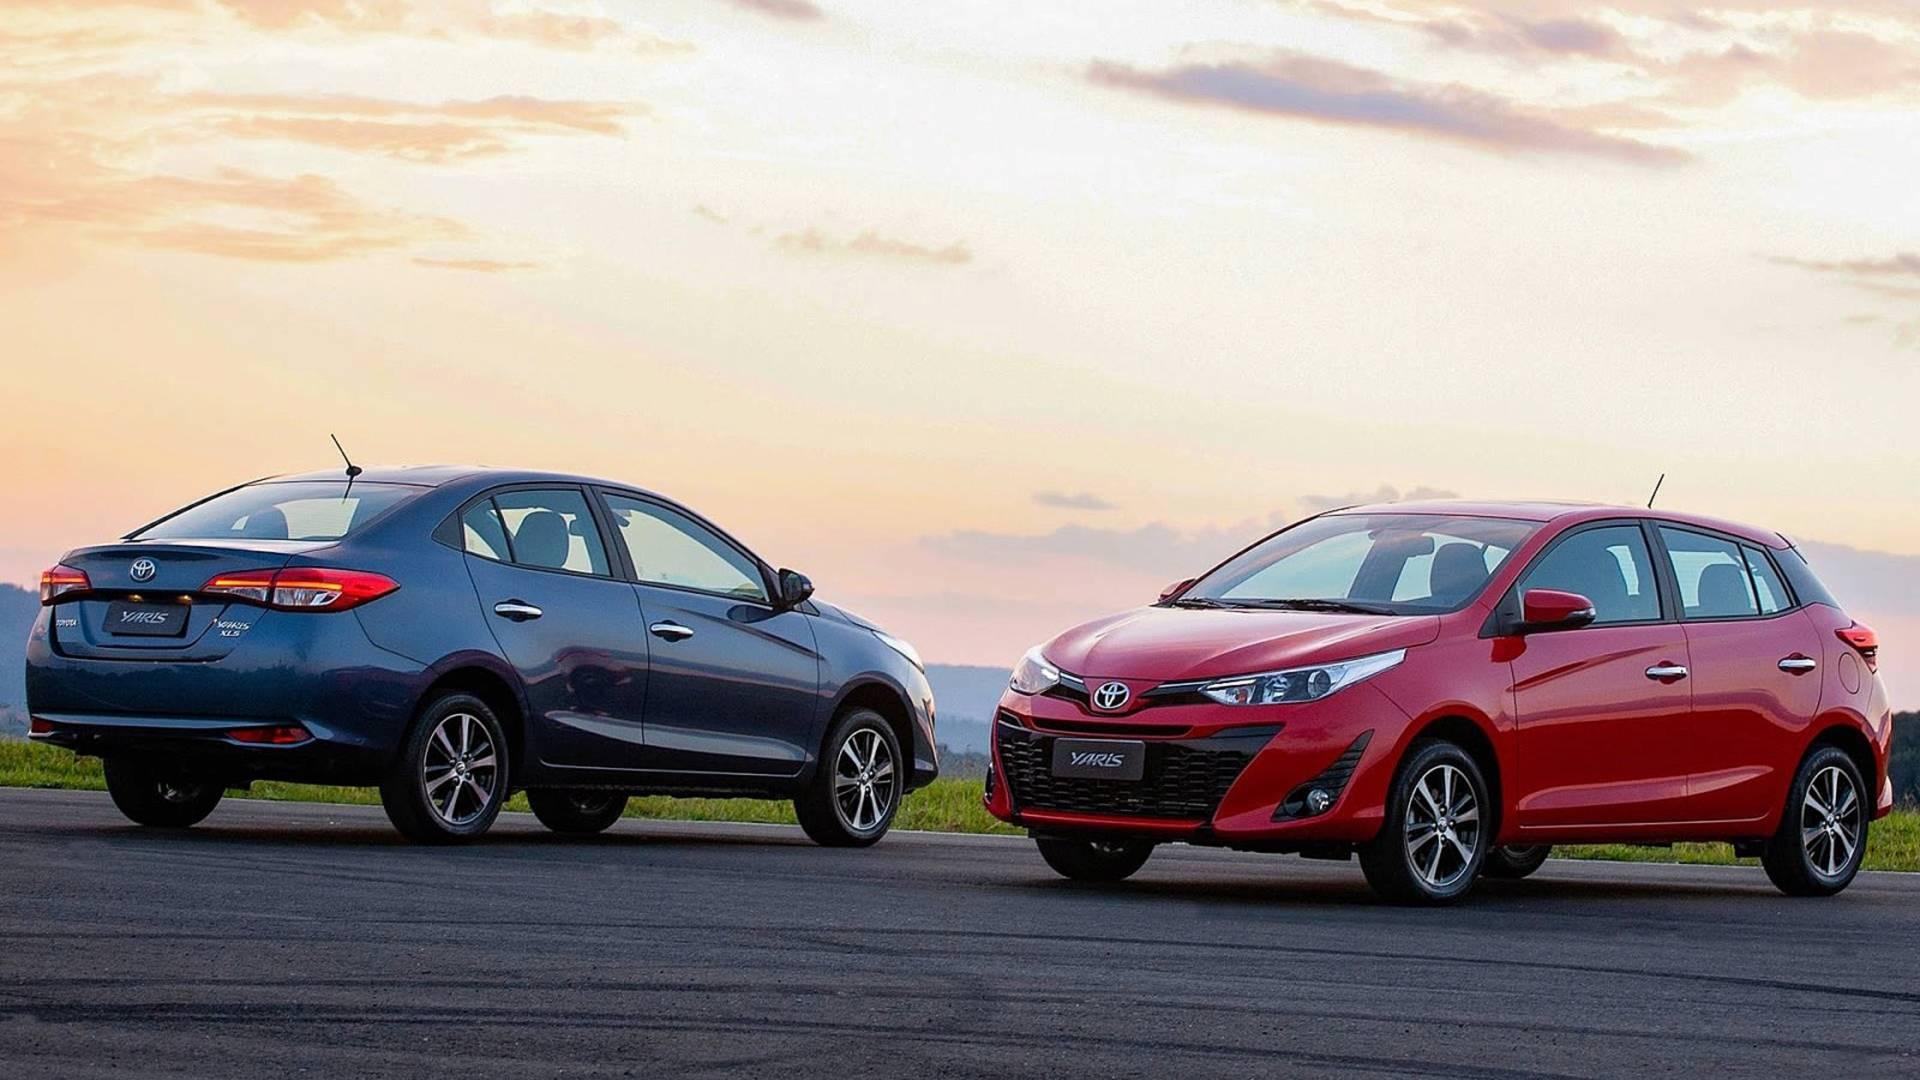 Oficial Toyota Yaris Chega Por R 59 590 Veja Versoes Conteudos E Precos